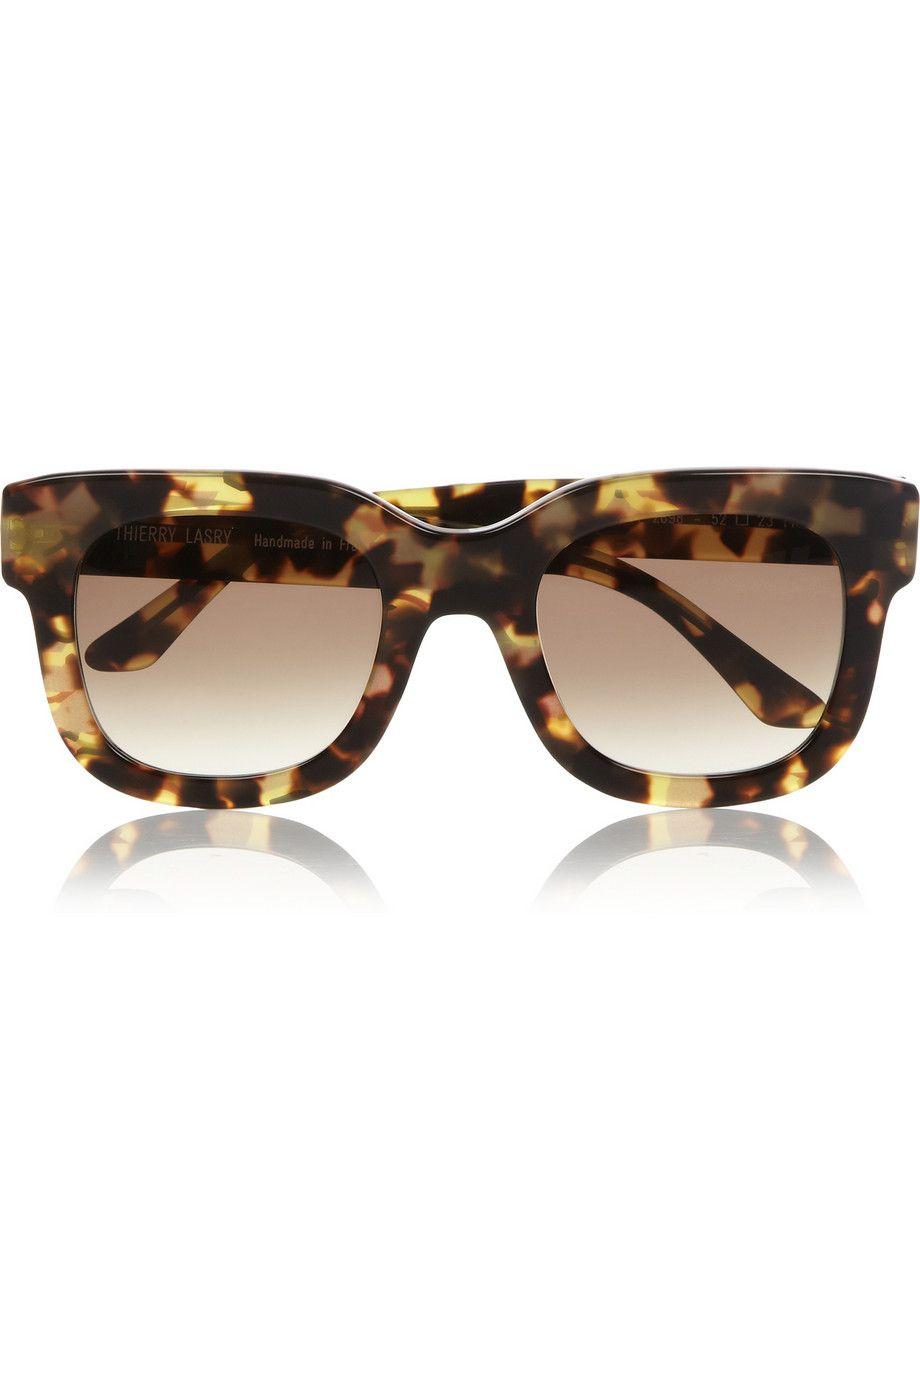 Thierry Lasry | Square-frame tortoiseshell acetate sunglasses